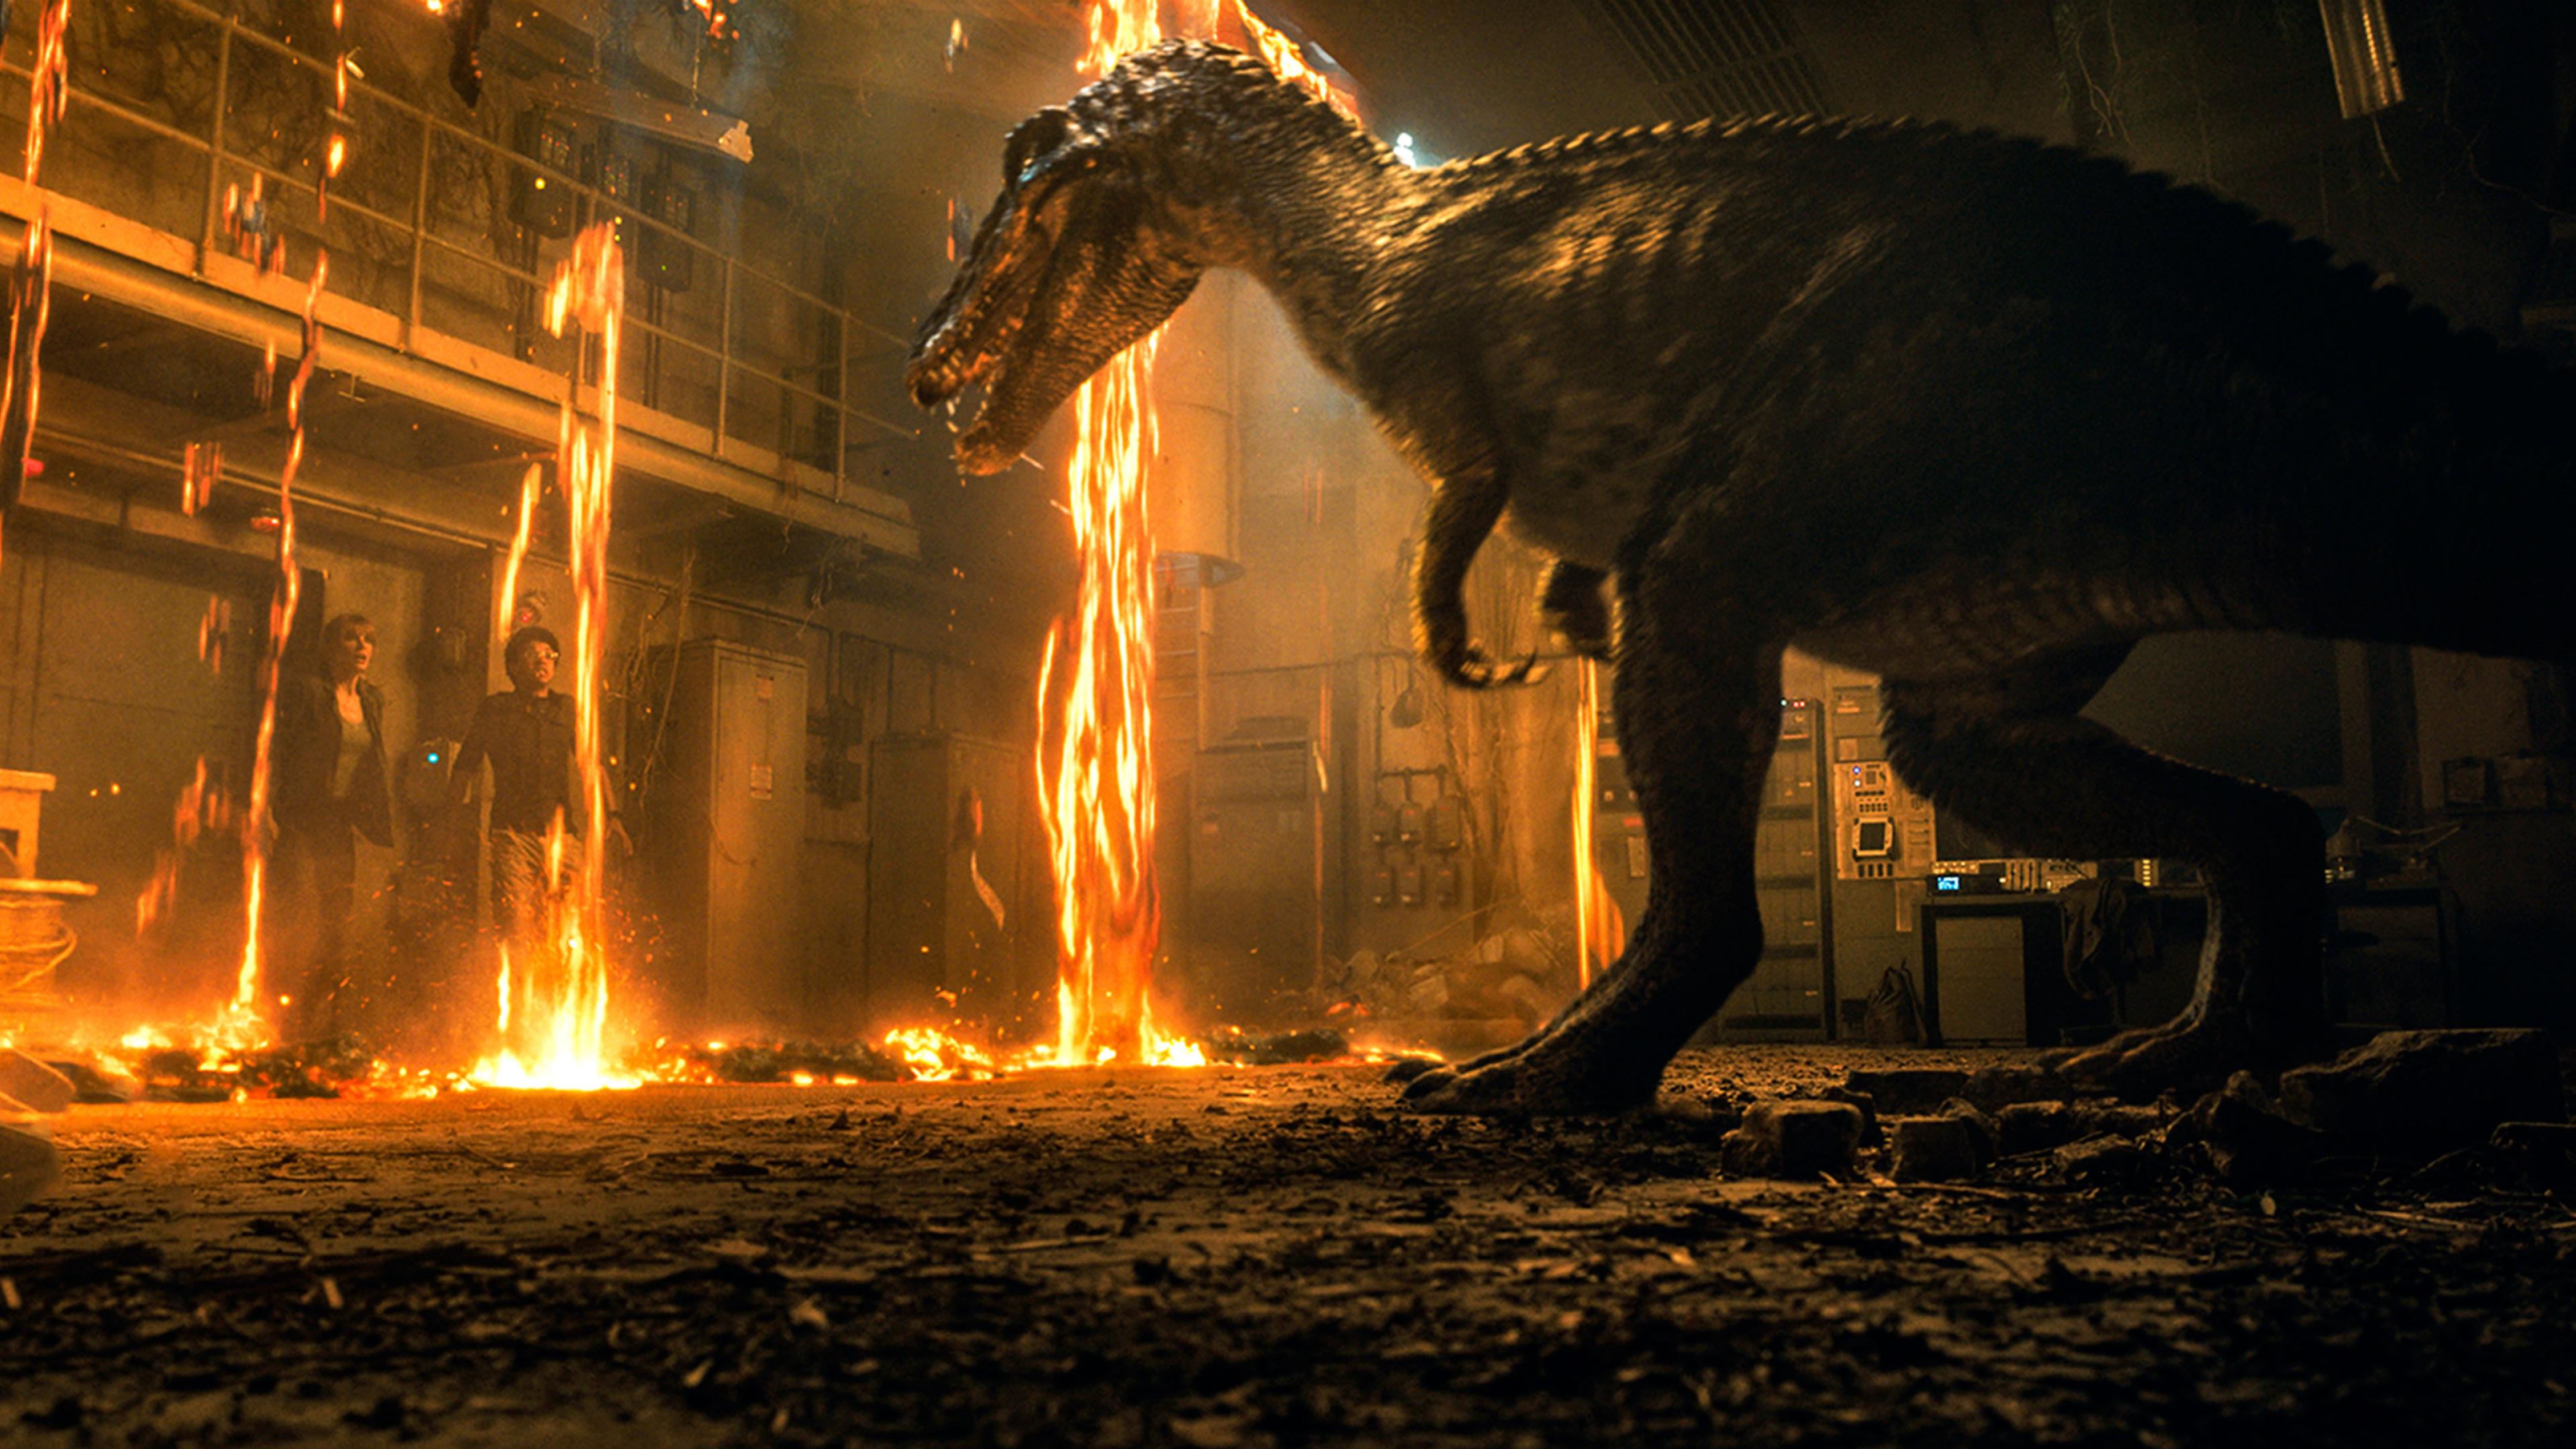 3840x2160 Baryonyx Dinosaur In Jurassic World 2018 4k